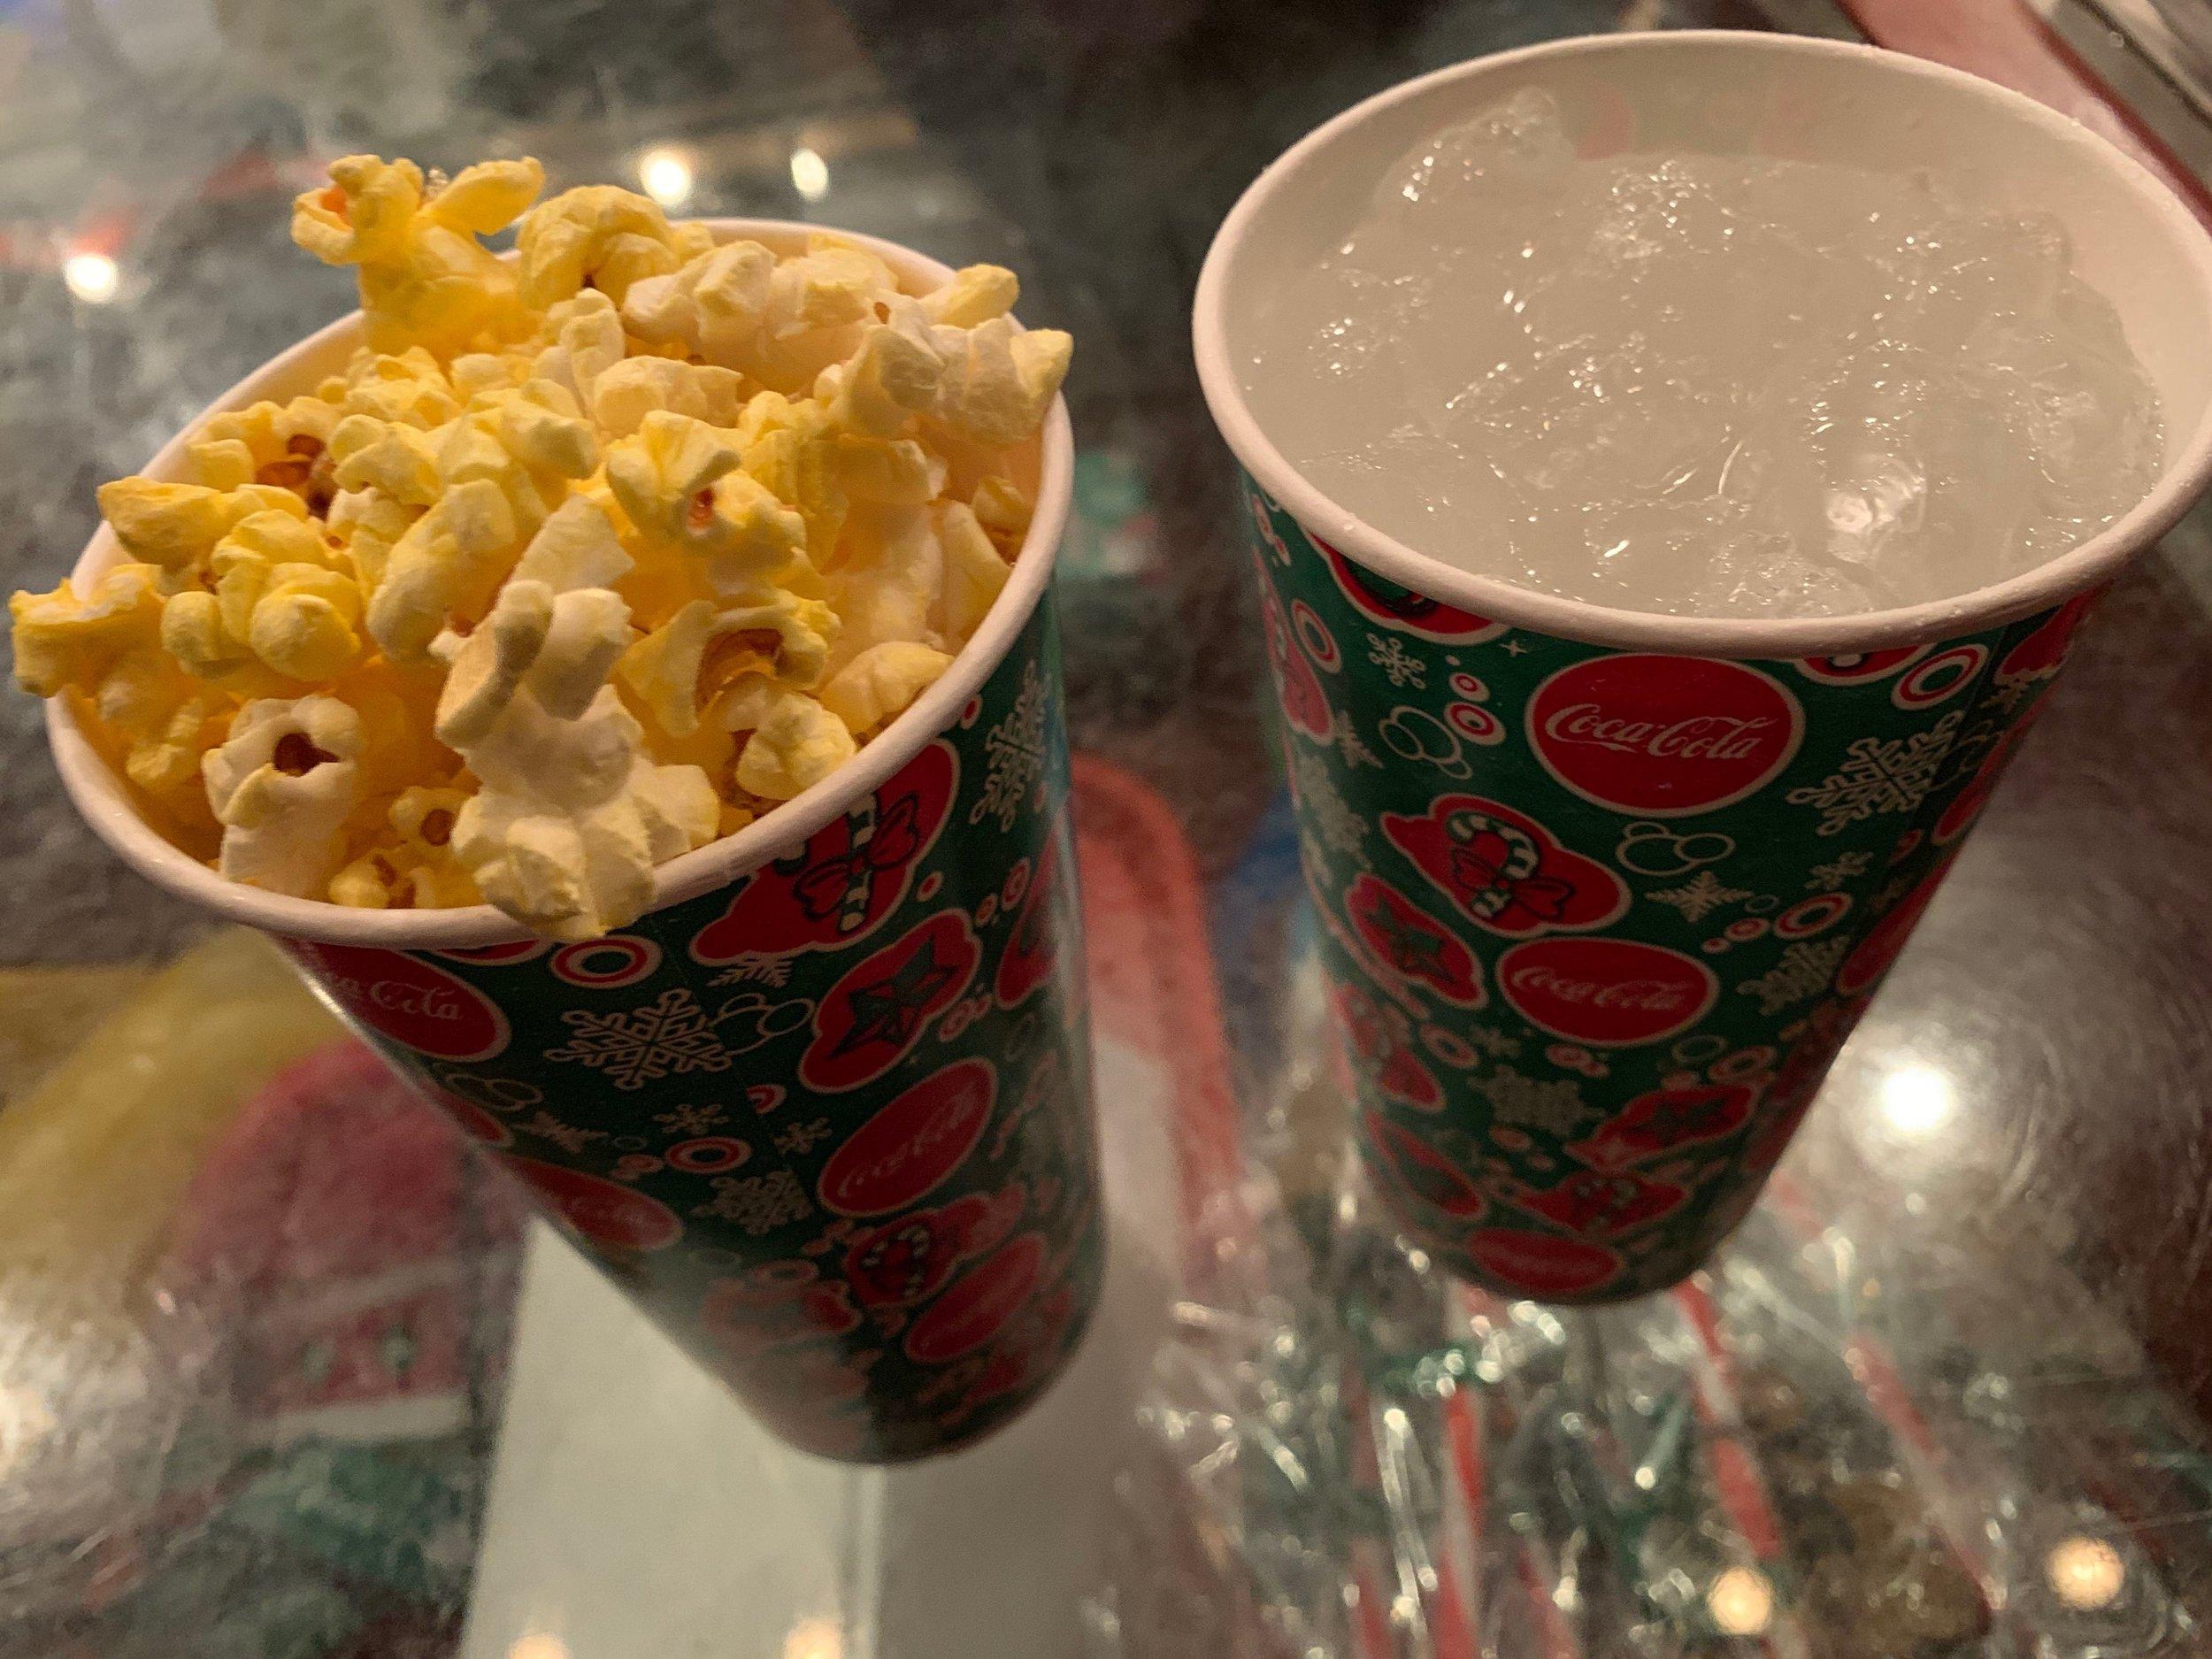 Snack size popcorn and sprite